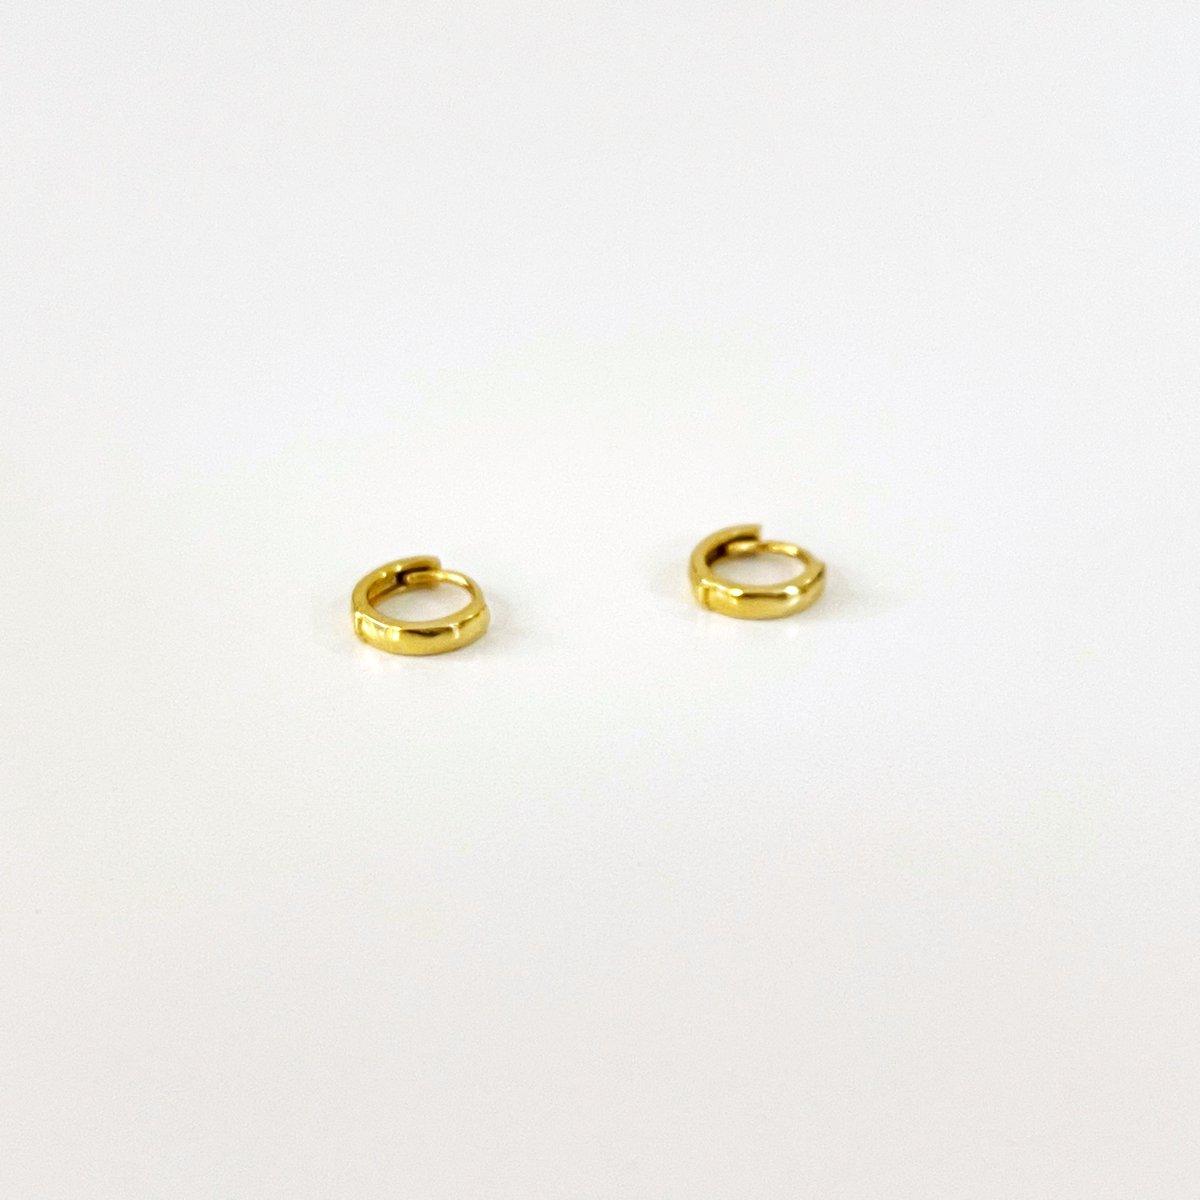 Image of Tiny huggy hoop earring